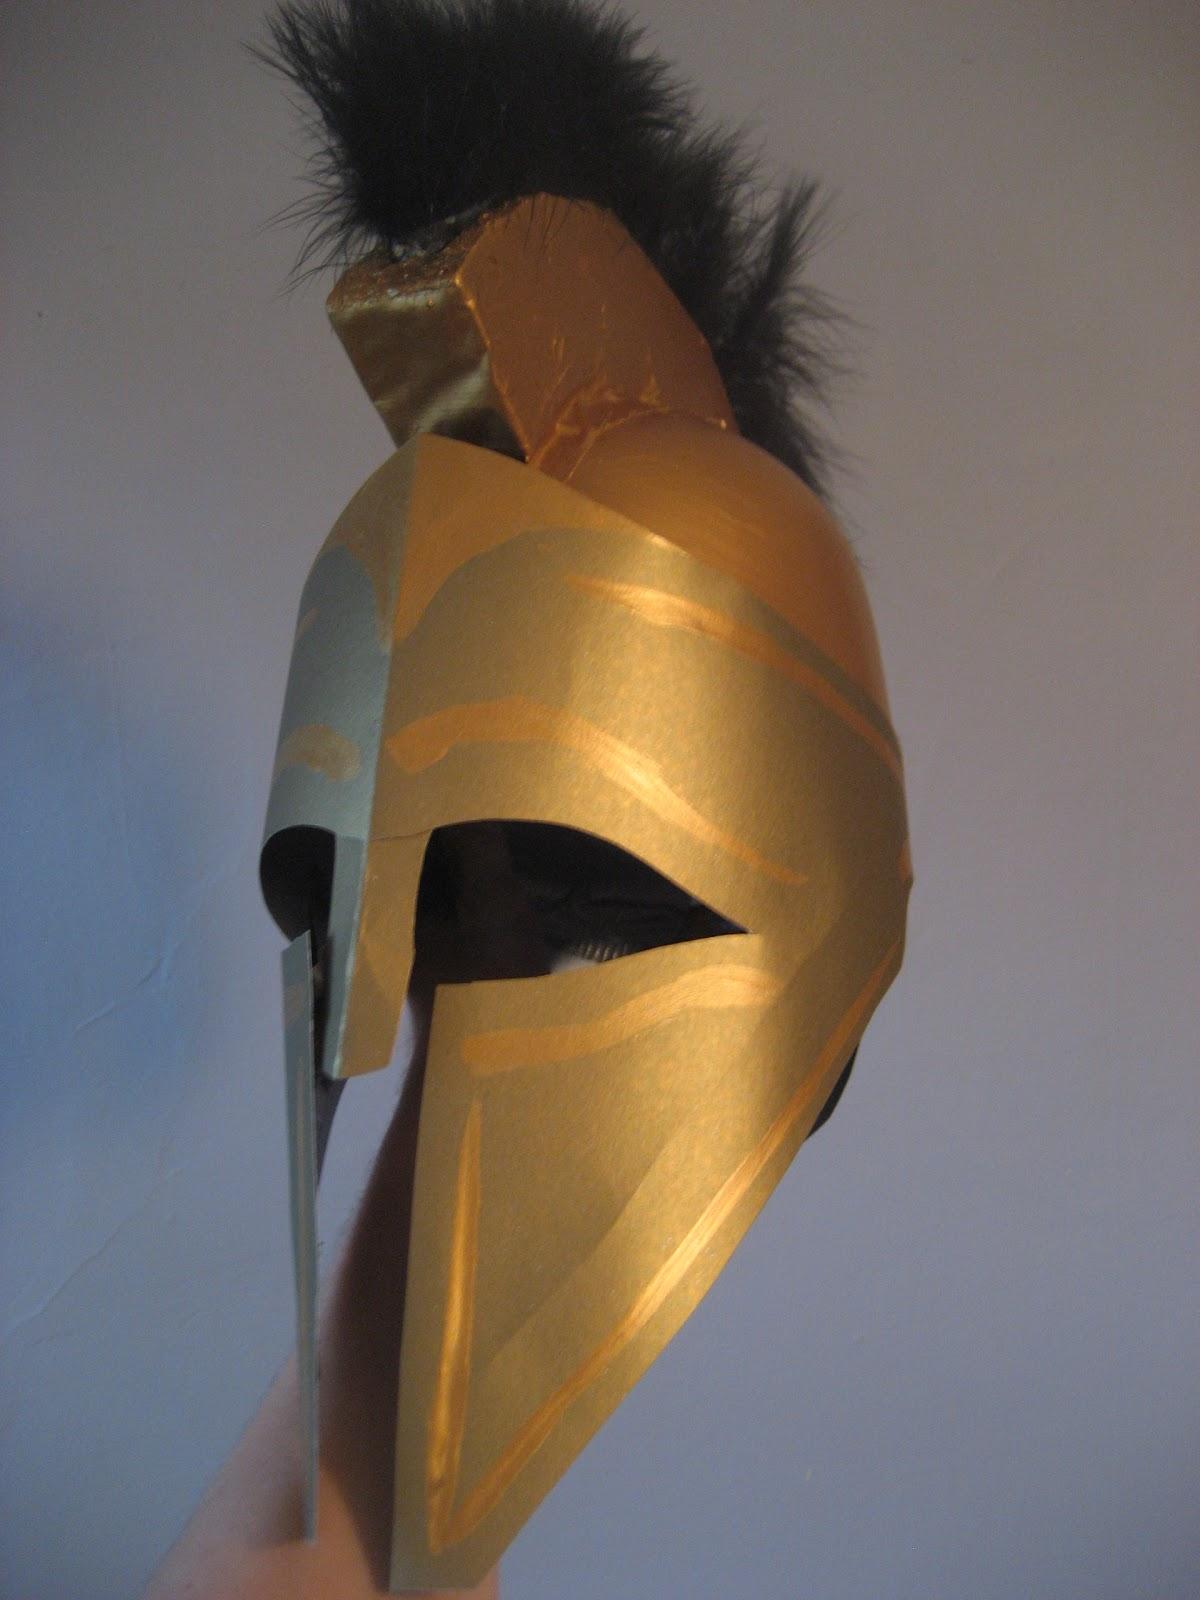 DIY Spartan Hoplite Costume How to Make a Helmet & Chuck Does Art: DIY Spartan Hoplite Costume: How to Make a Helmet